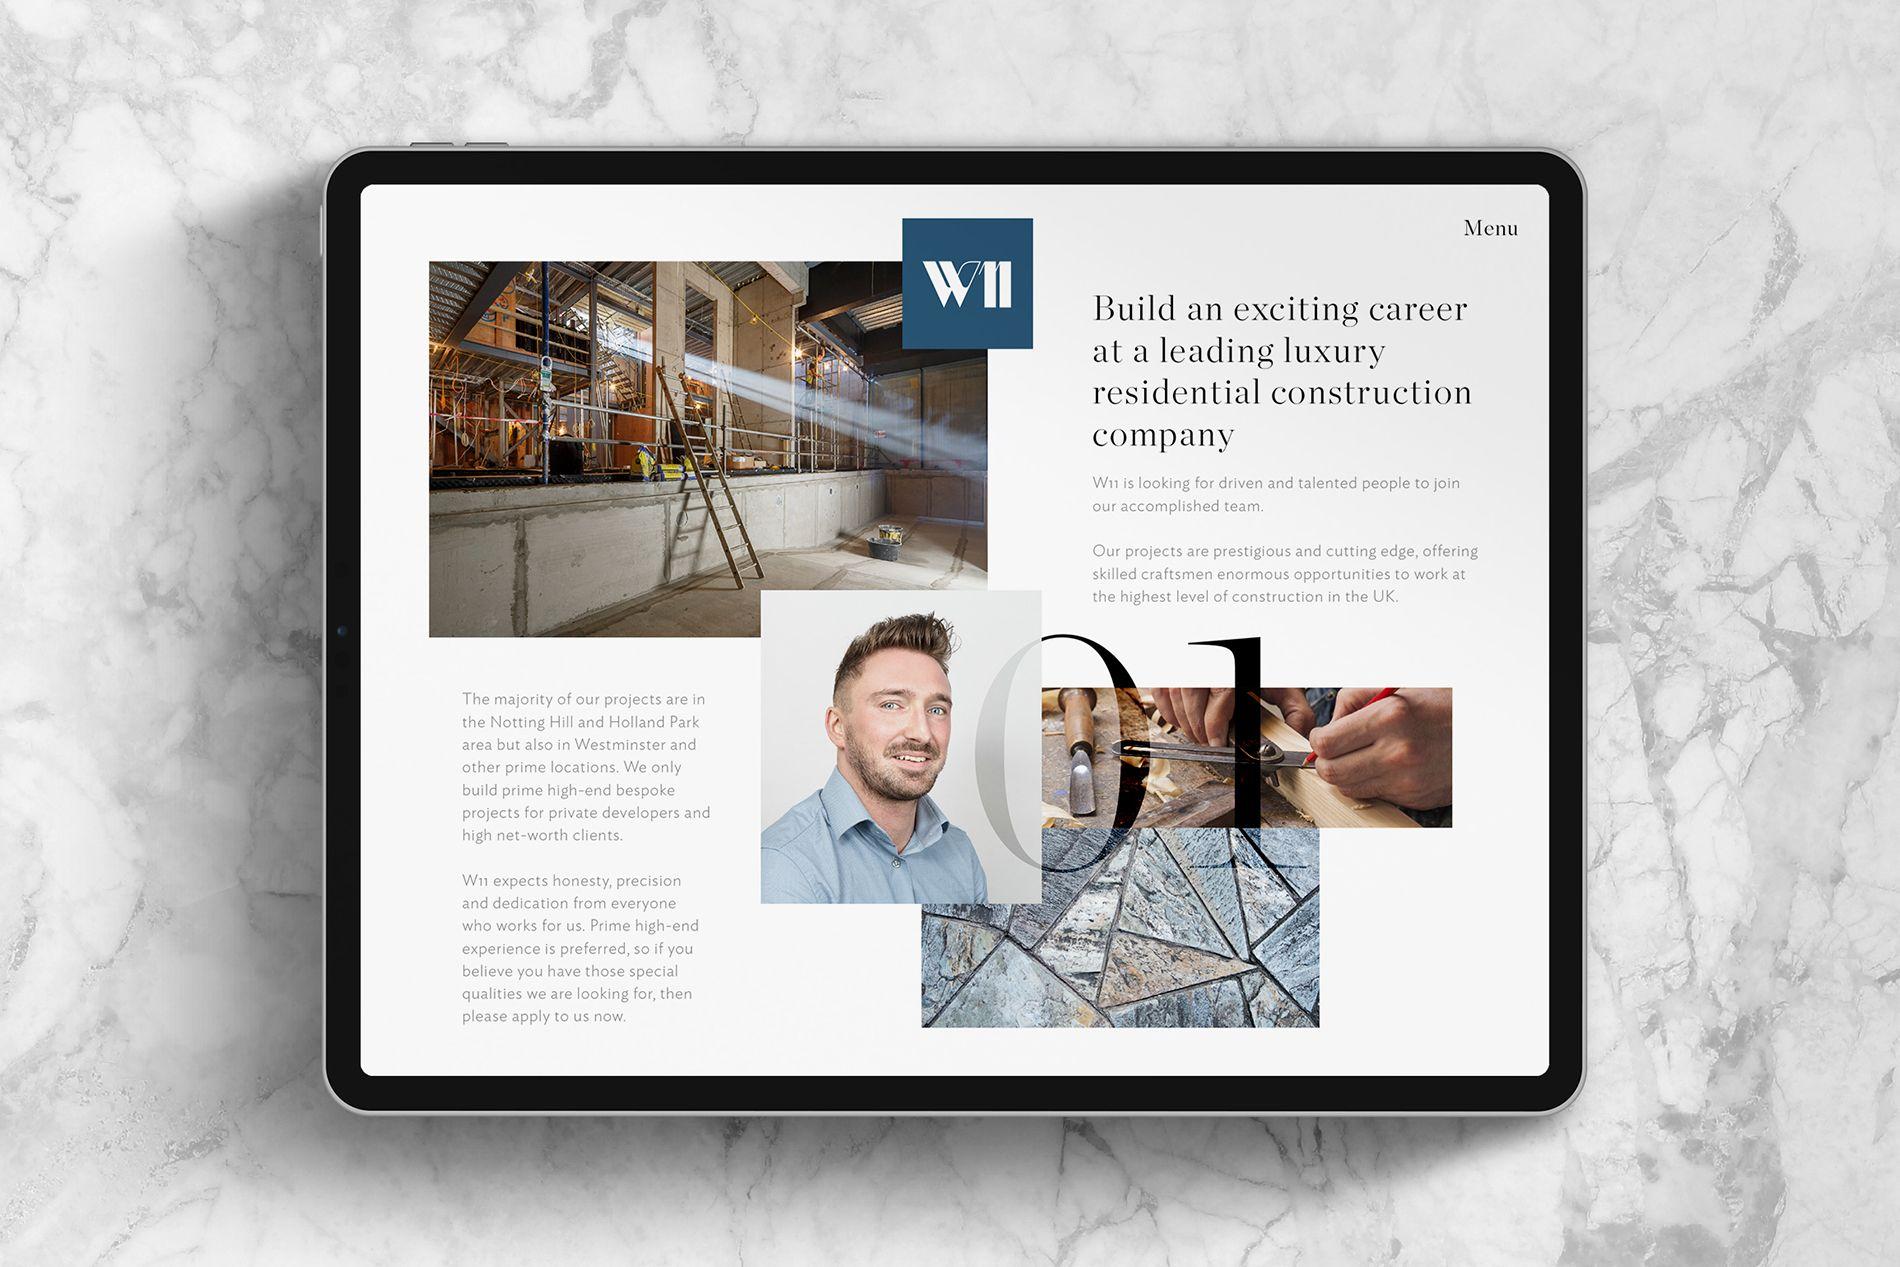 ipad showing web design